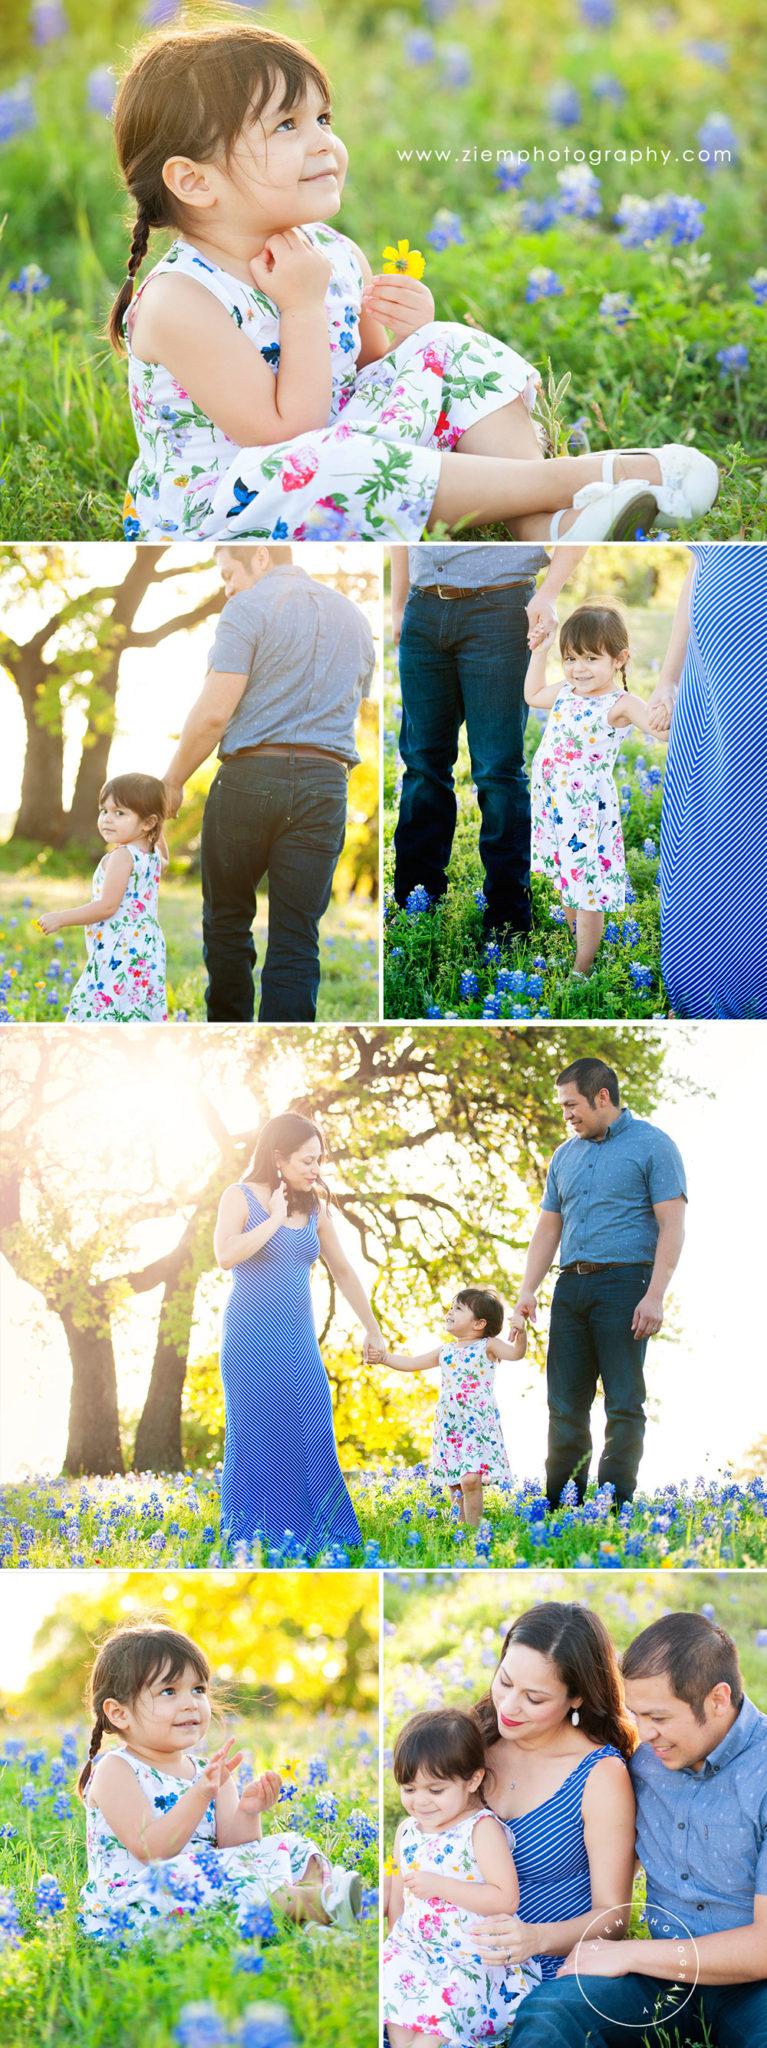 austin maternity photographers ziem photography